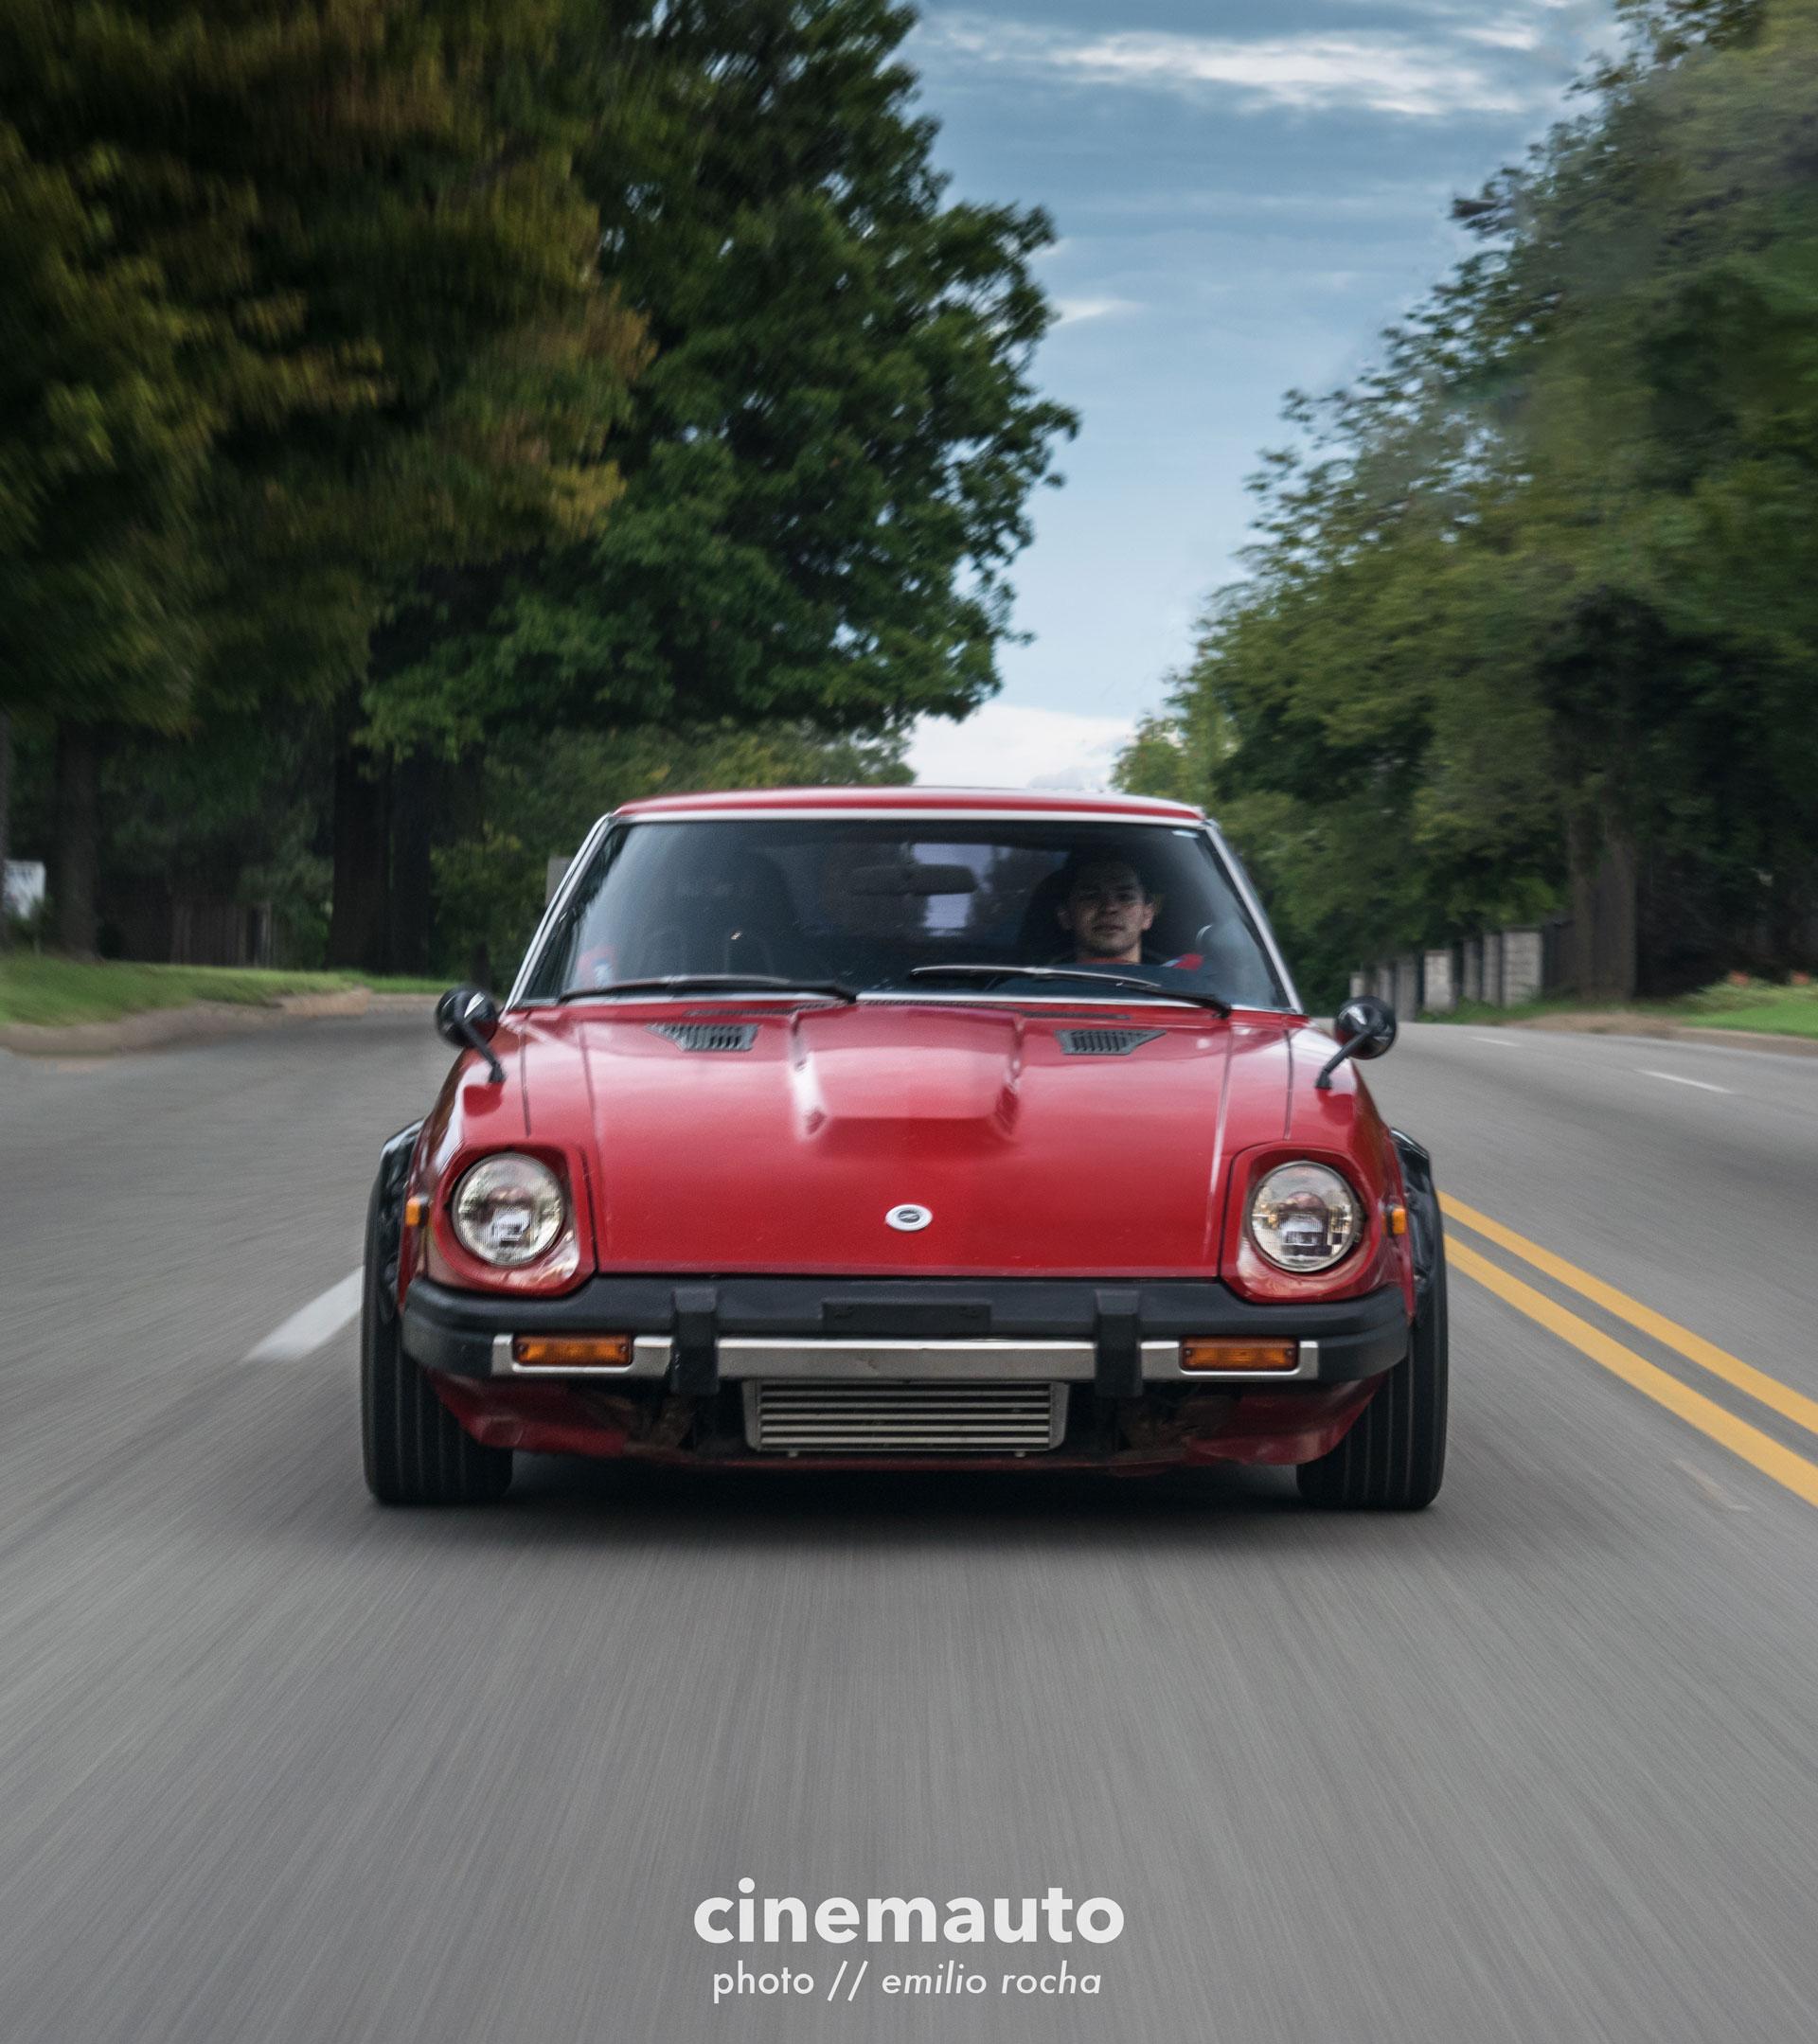 cinemauto-kansas-automotive-photography-datsun18.jpg